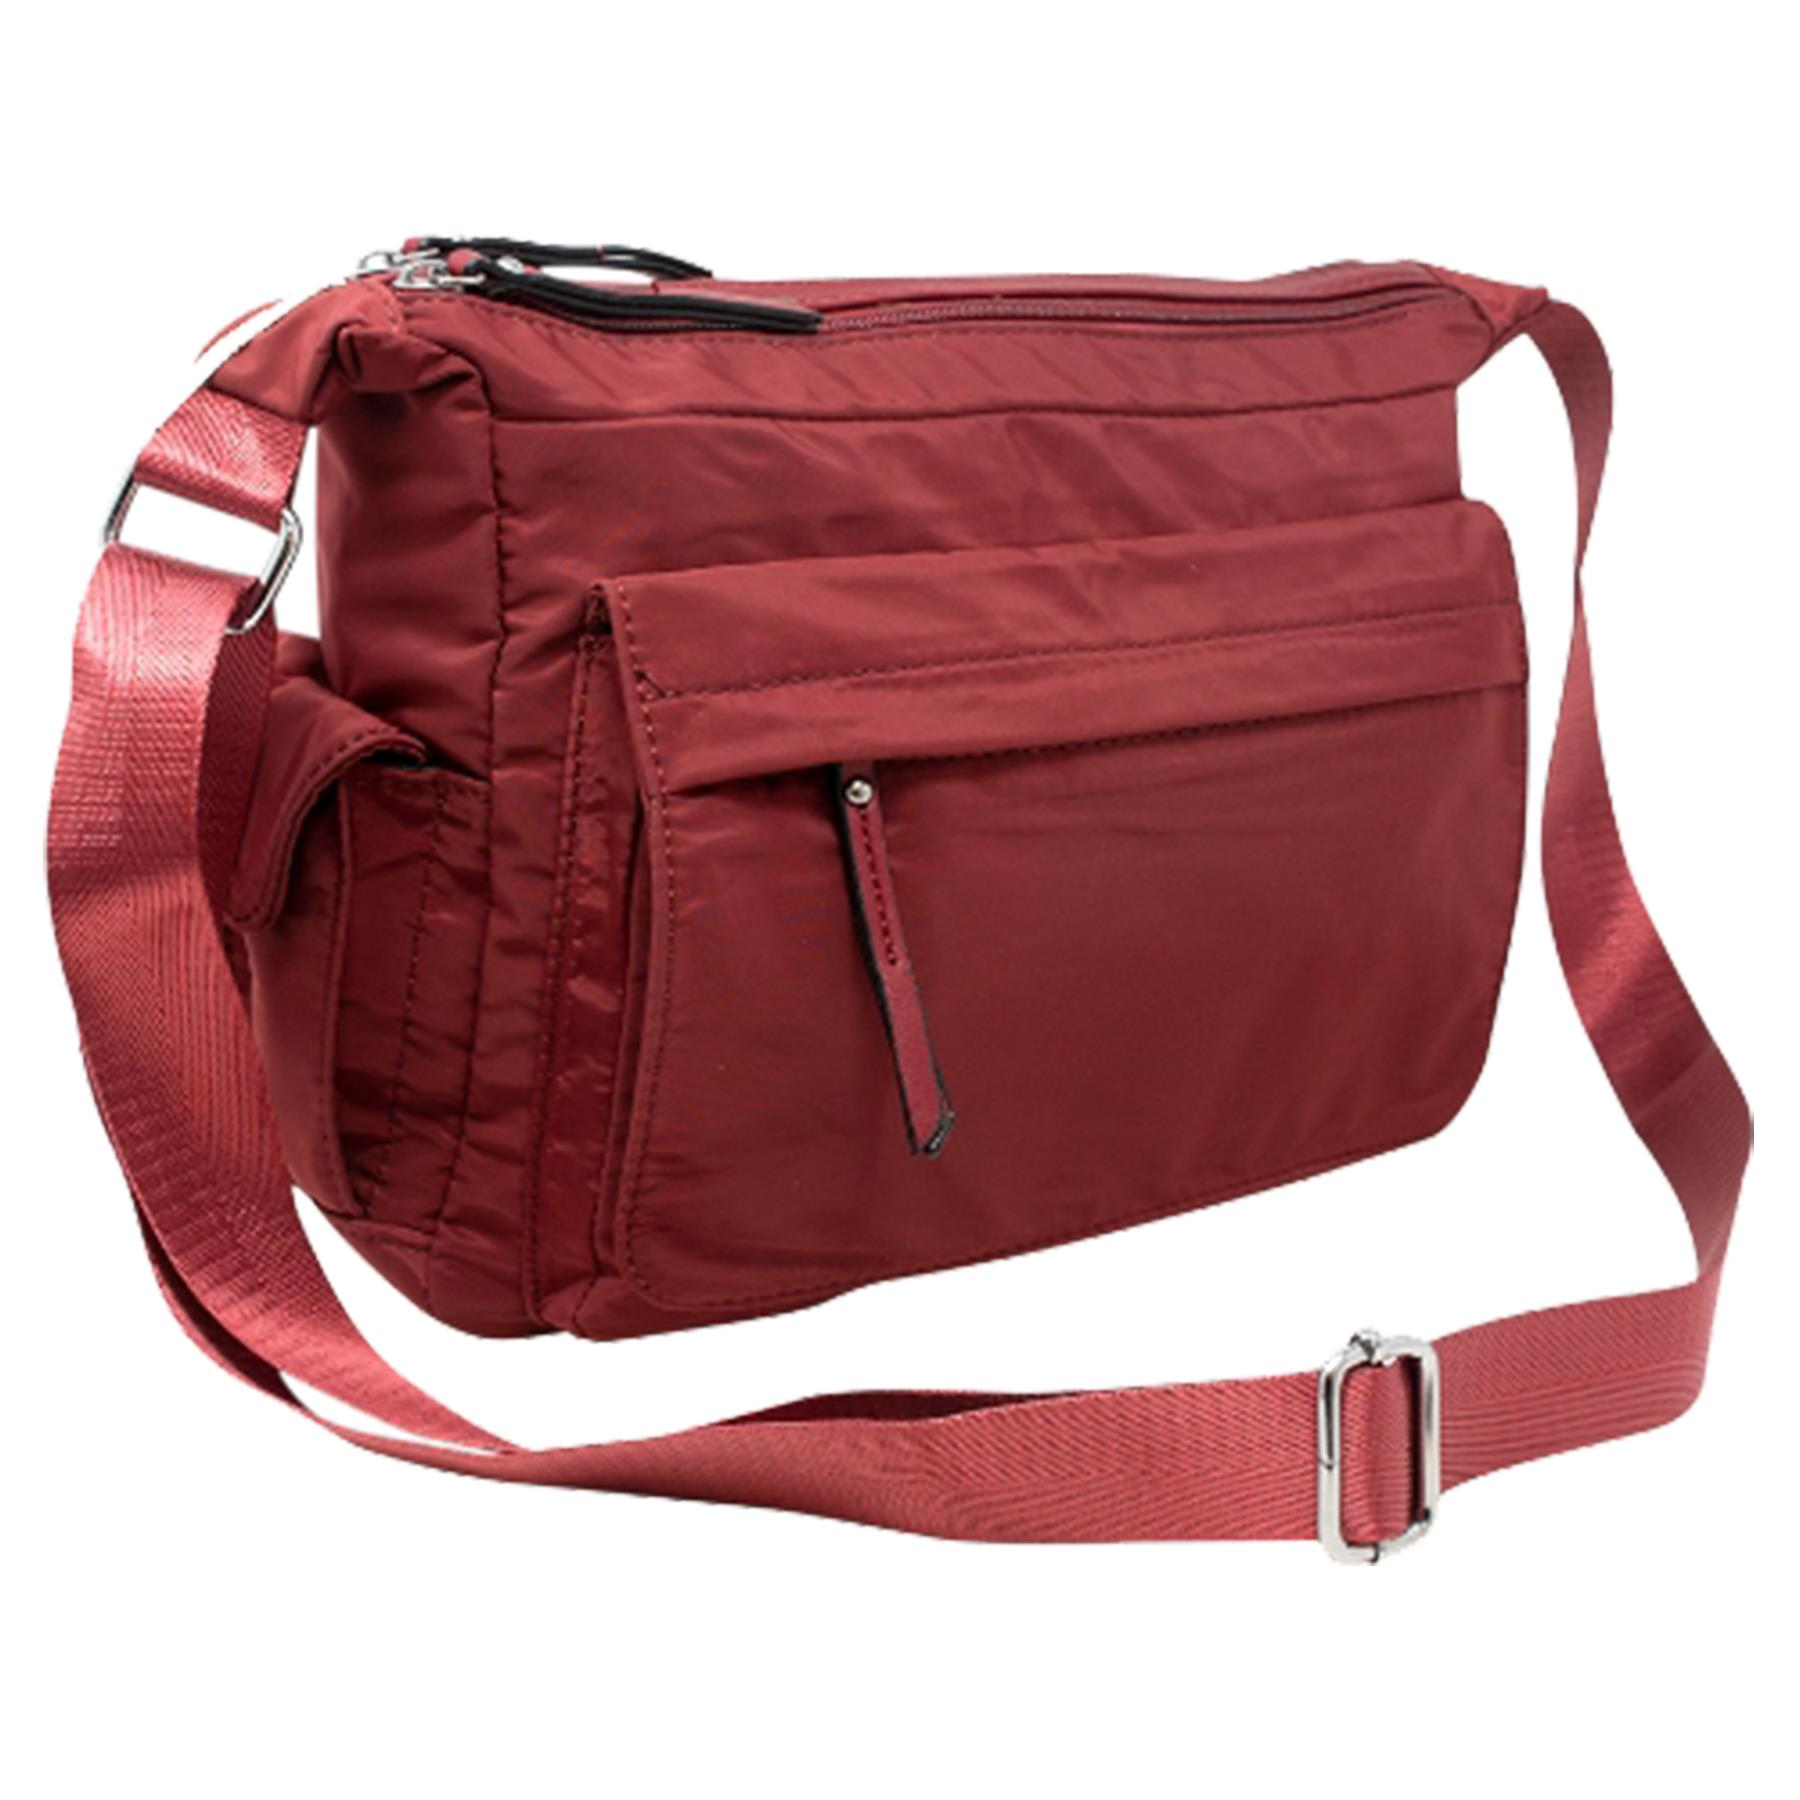 New-Ladies-Men-s-Showerproof-School-College-Practical-Basic-Crossbody-Bag thumbnail 33